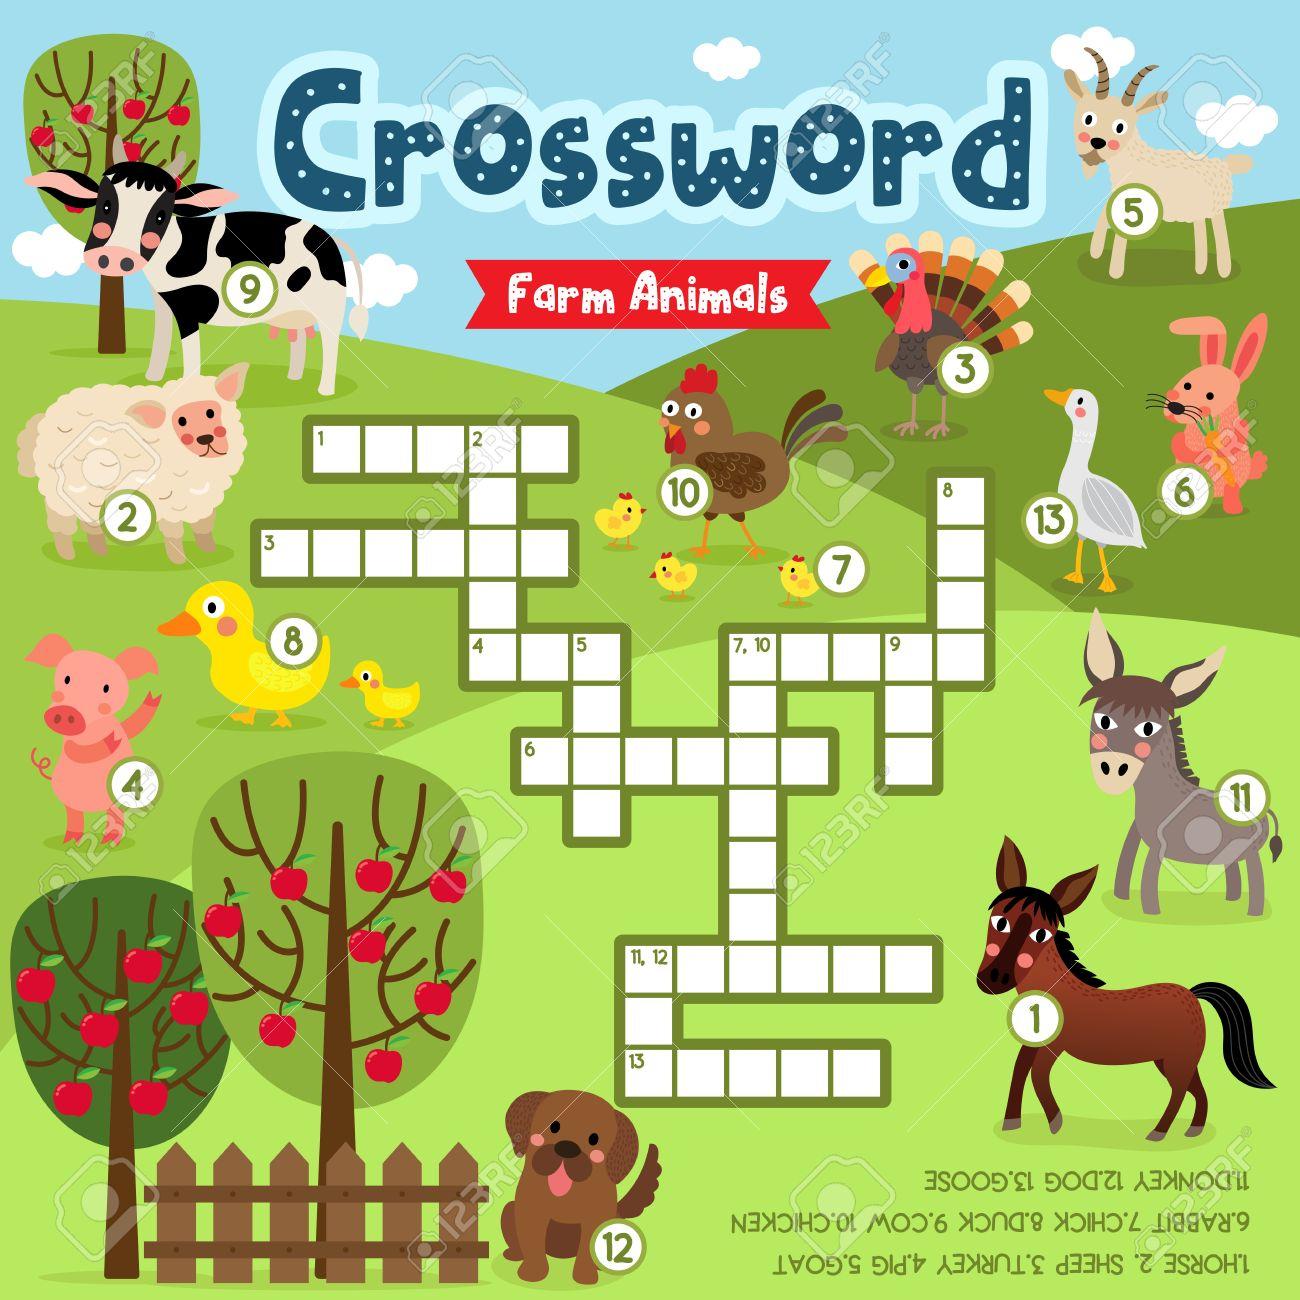 Crosswords Puzzle Game Of Farm Animals For Preschool Kids Activity - Printable Animal Puzzle